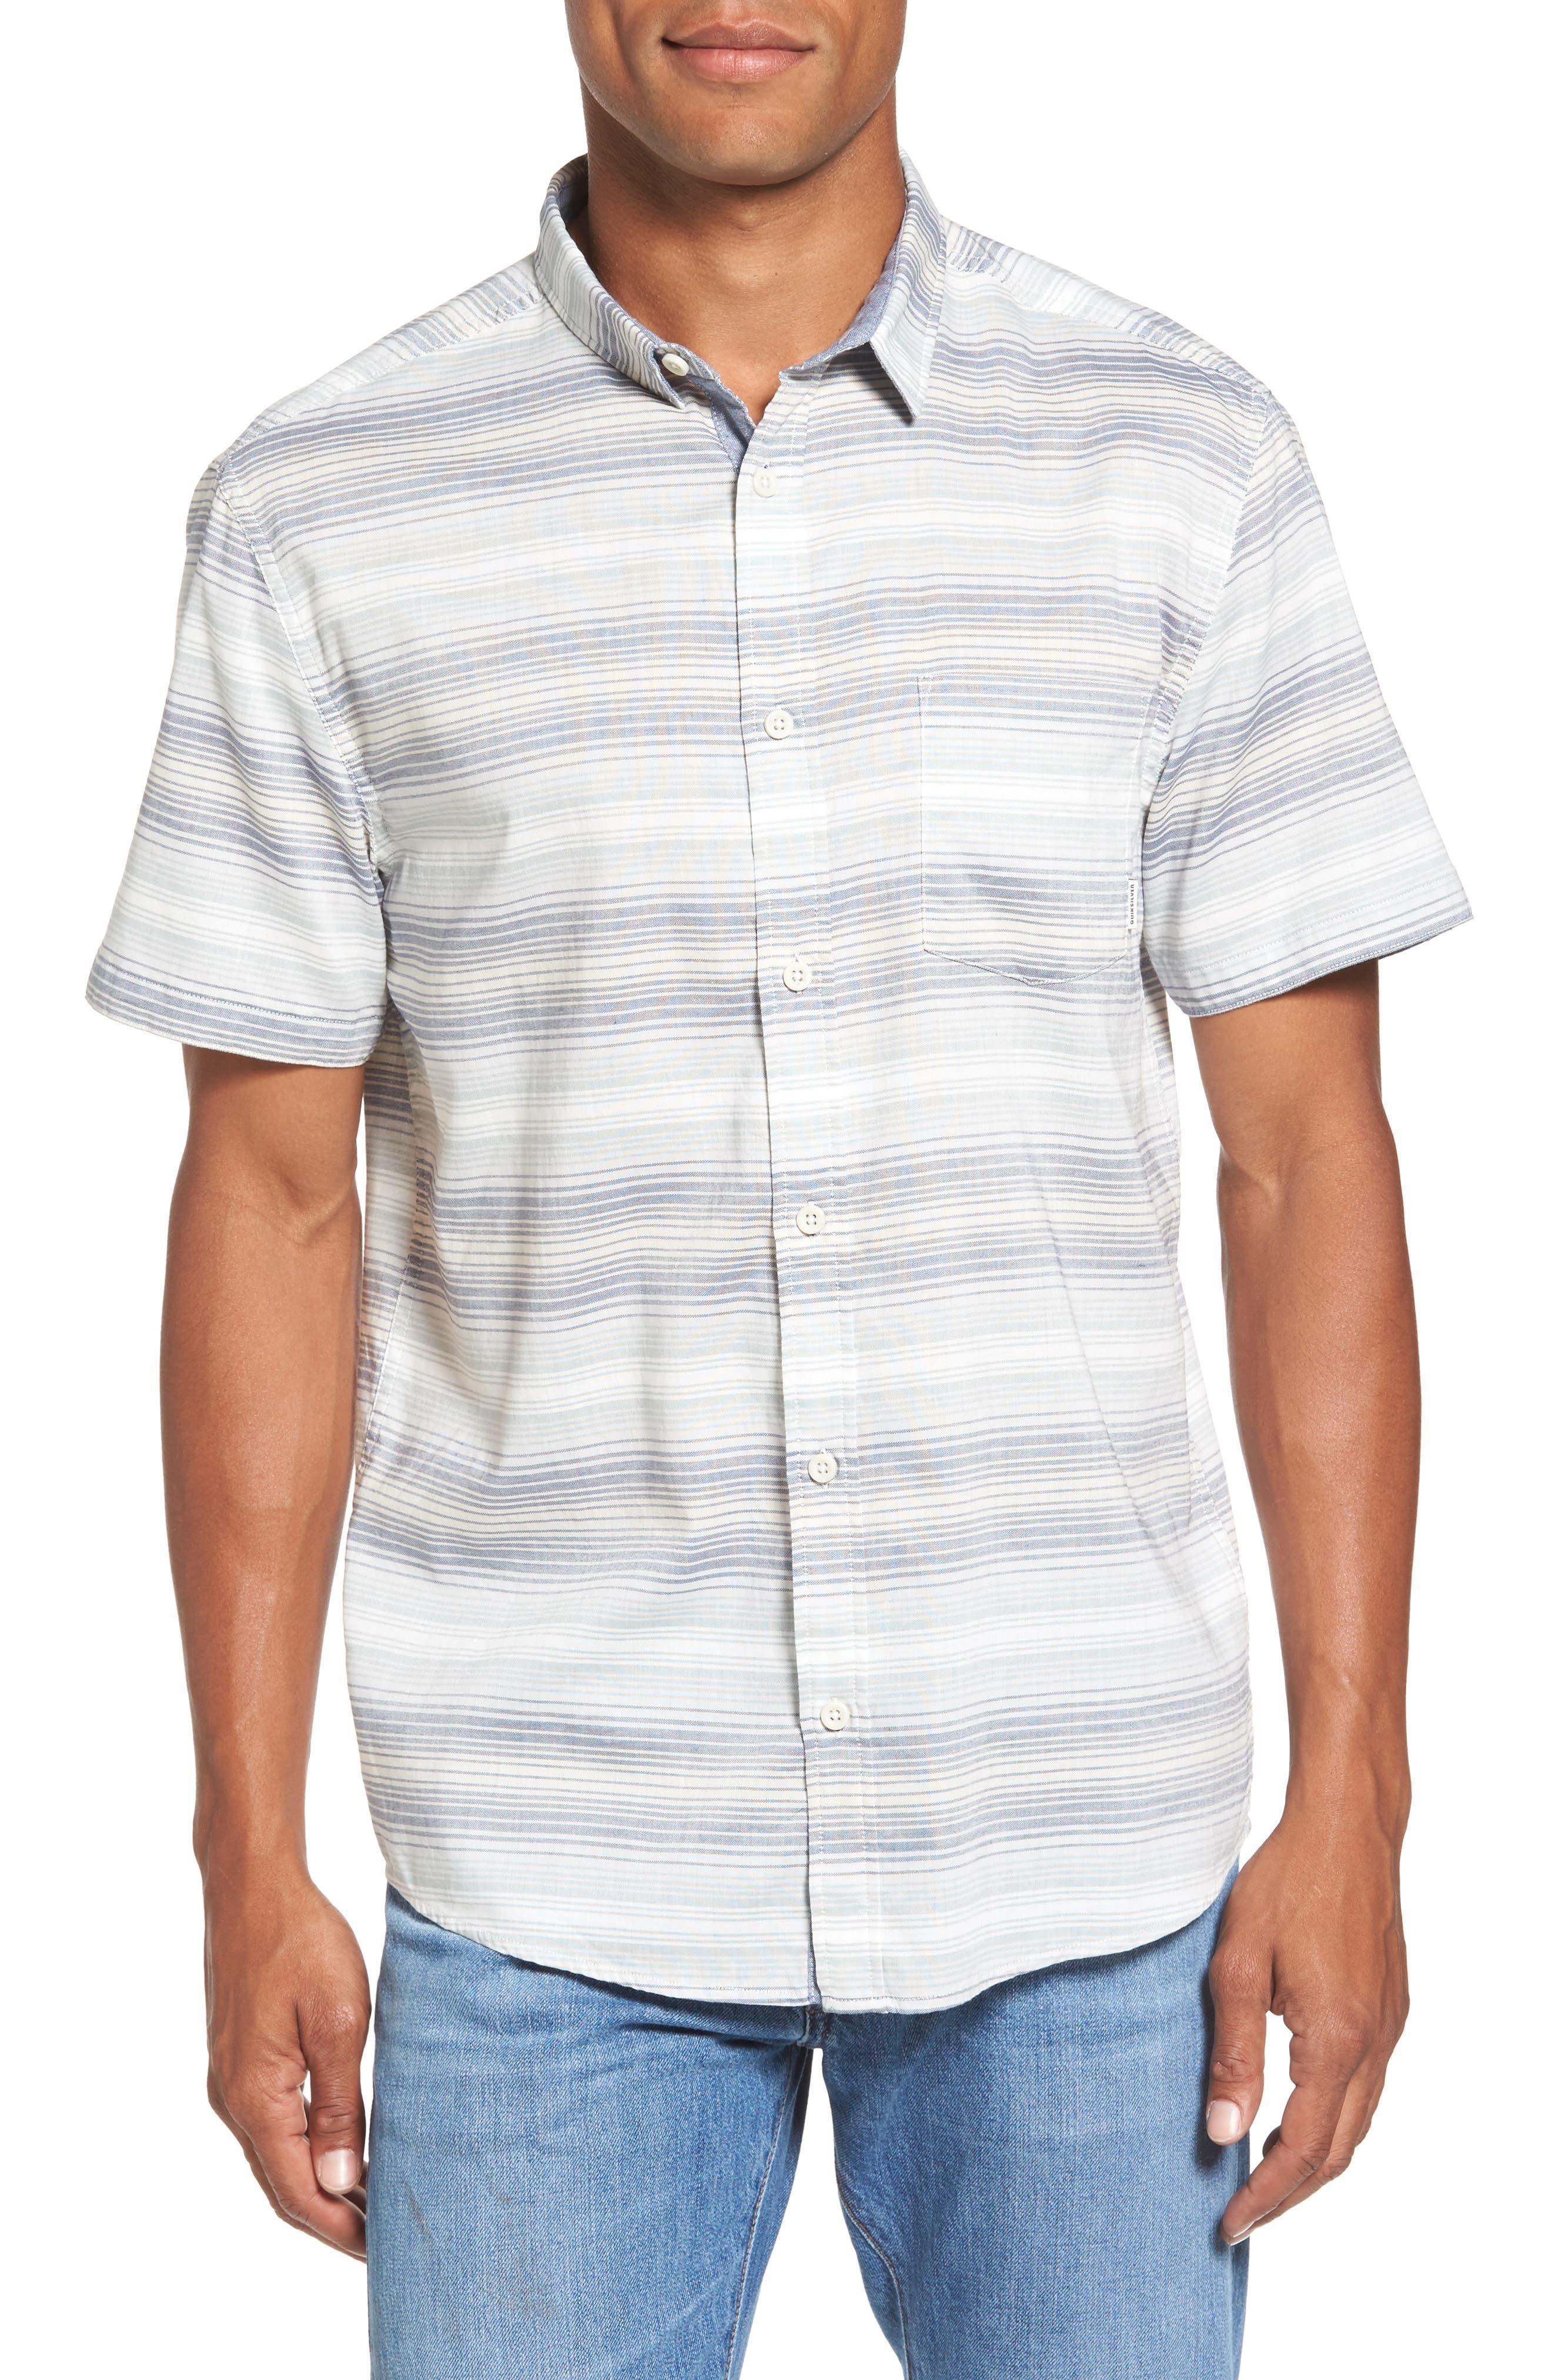 Aventail Stripe Shirt,                             Main thumbnail 1, color,